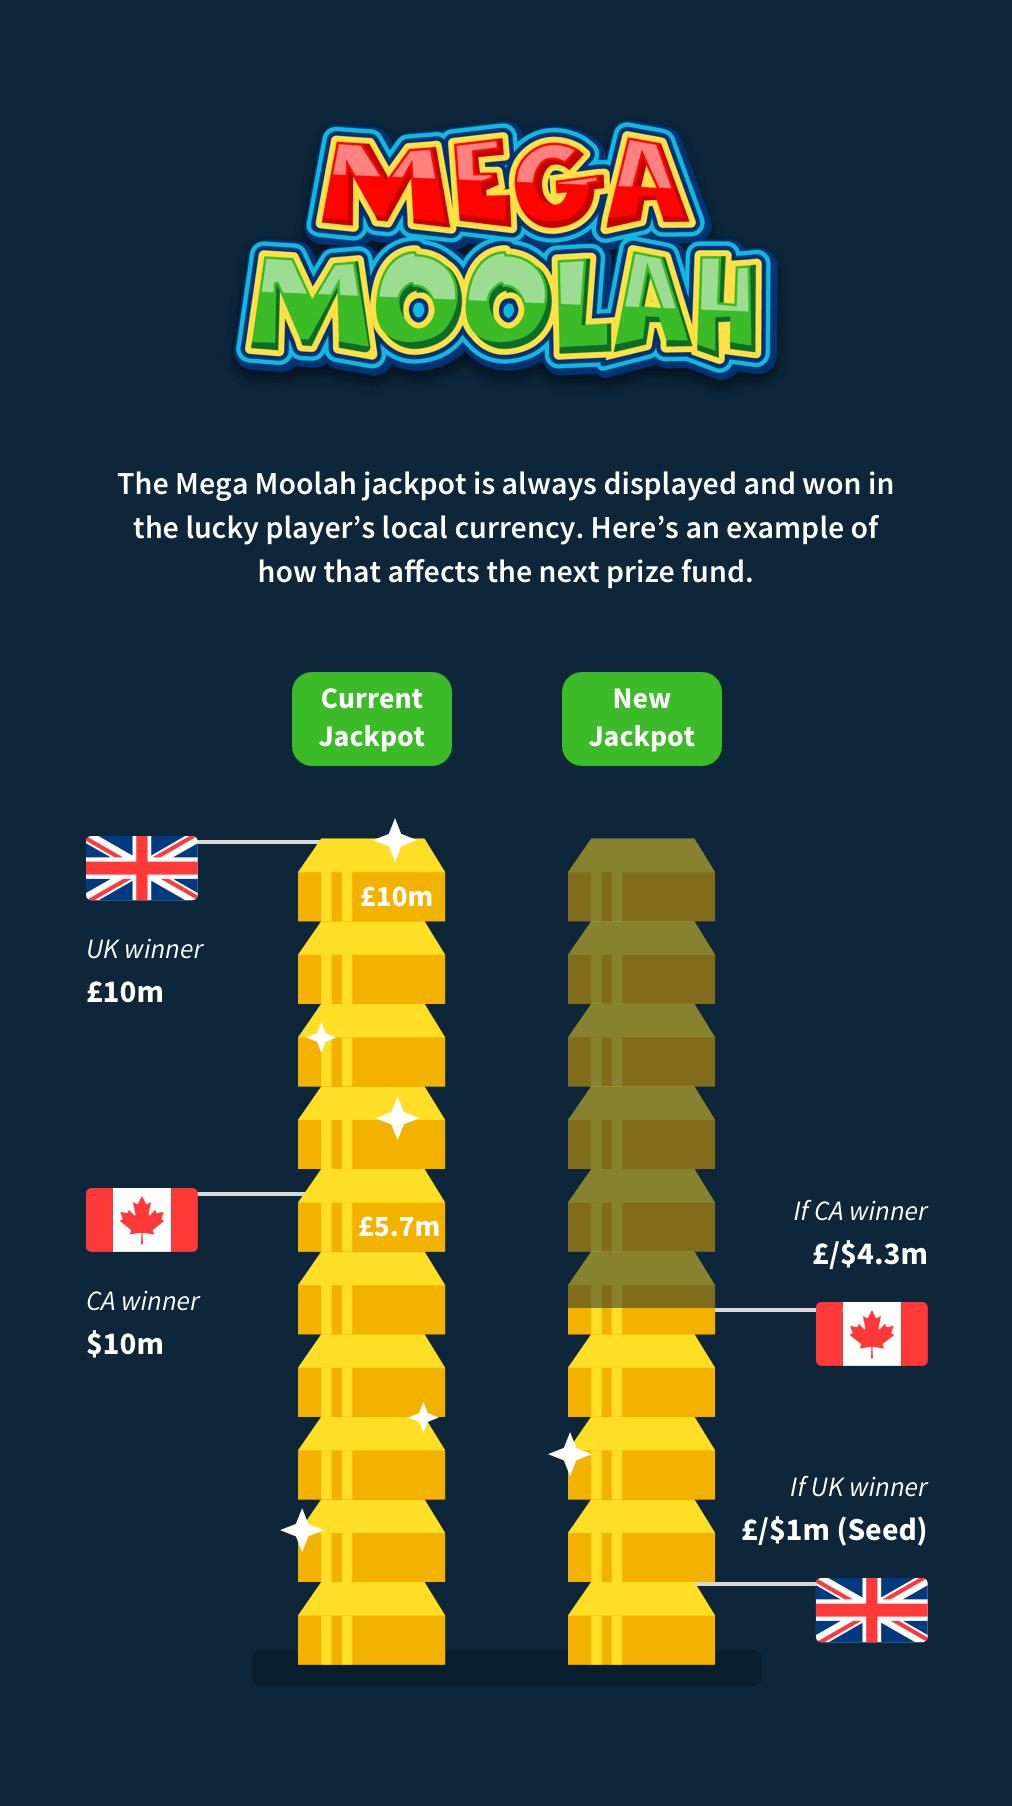 Mega Moolah Jackpot Infographic